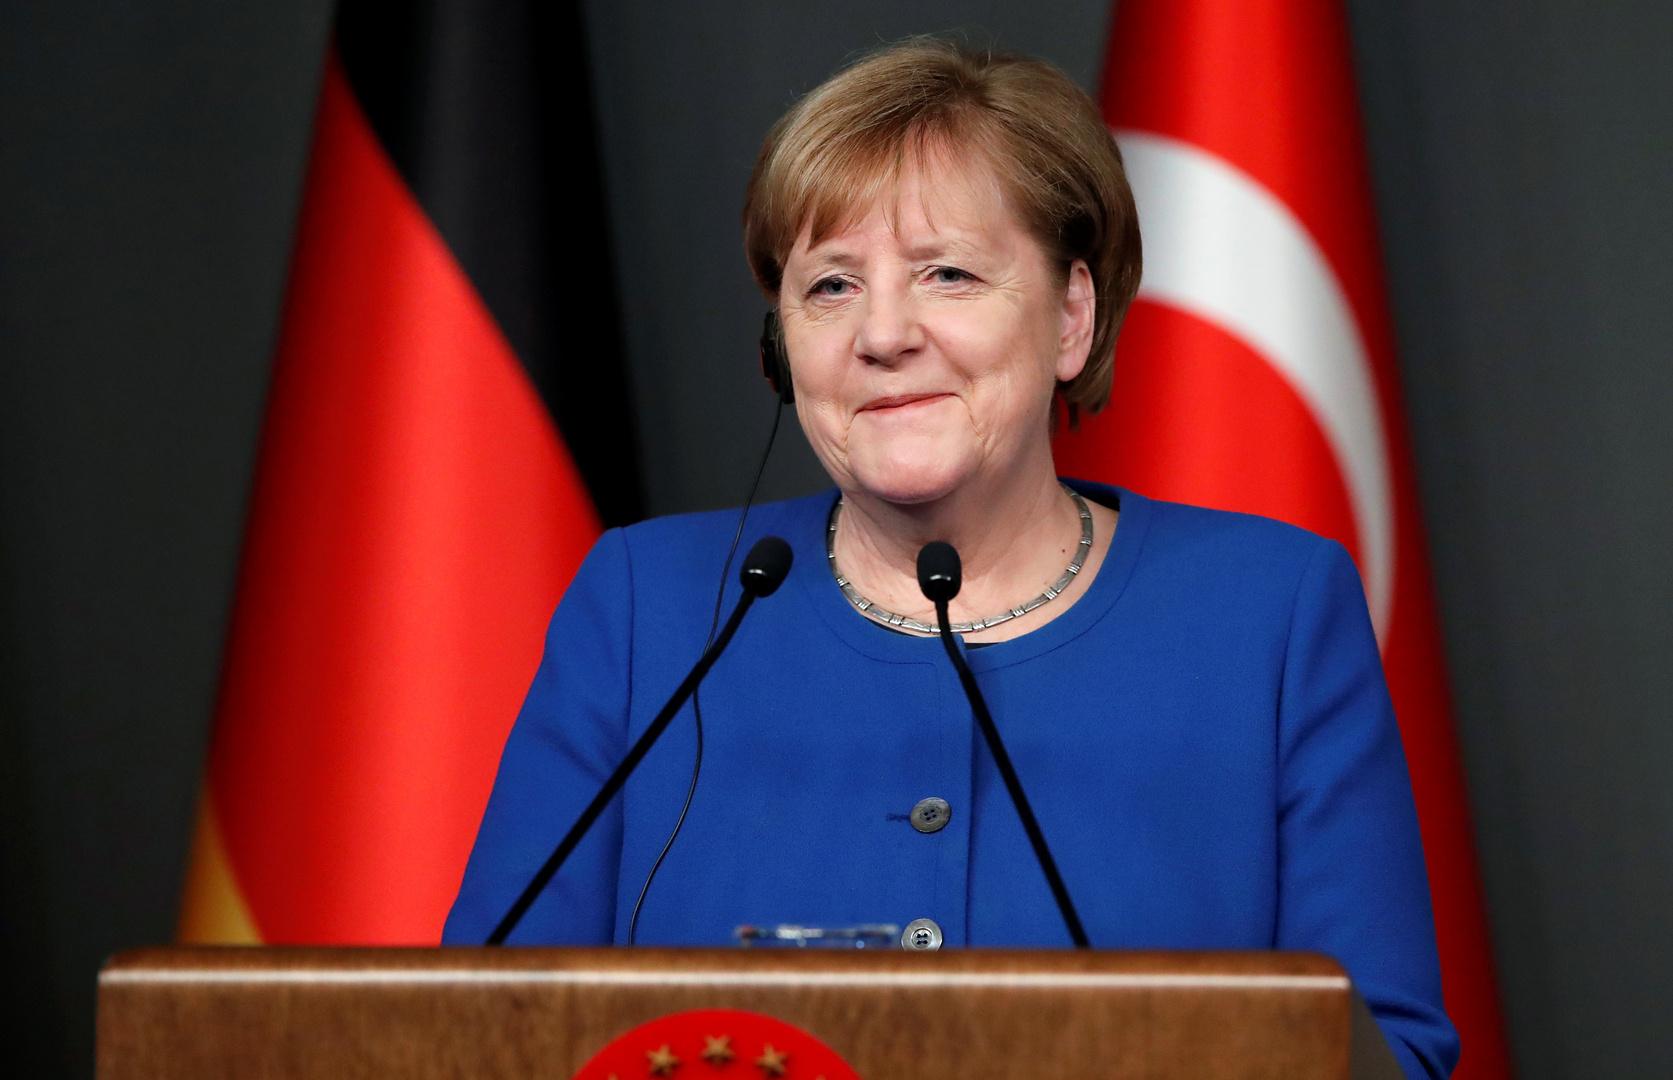 ميركل تعلن دعمها للقاء ألماني تركي روسي فرنسي حول سوريا